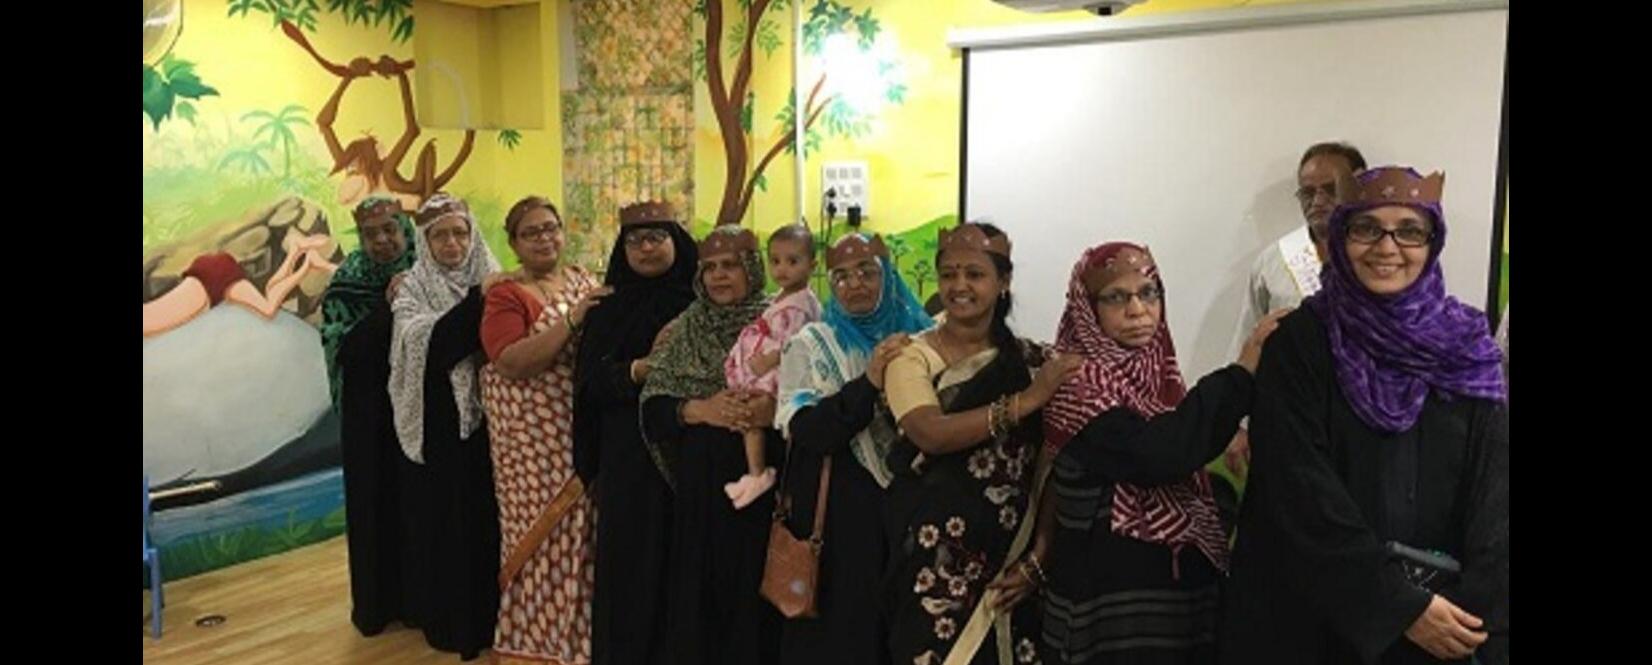 Rosy International School - Kindergarten, Kids Nursery and Playgroup and School in Saidabad, Hyderabad